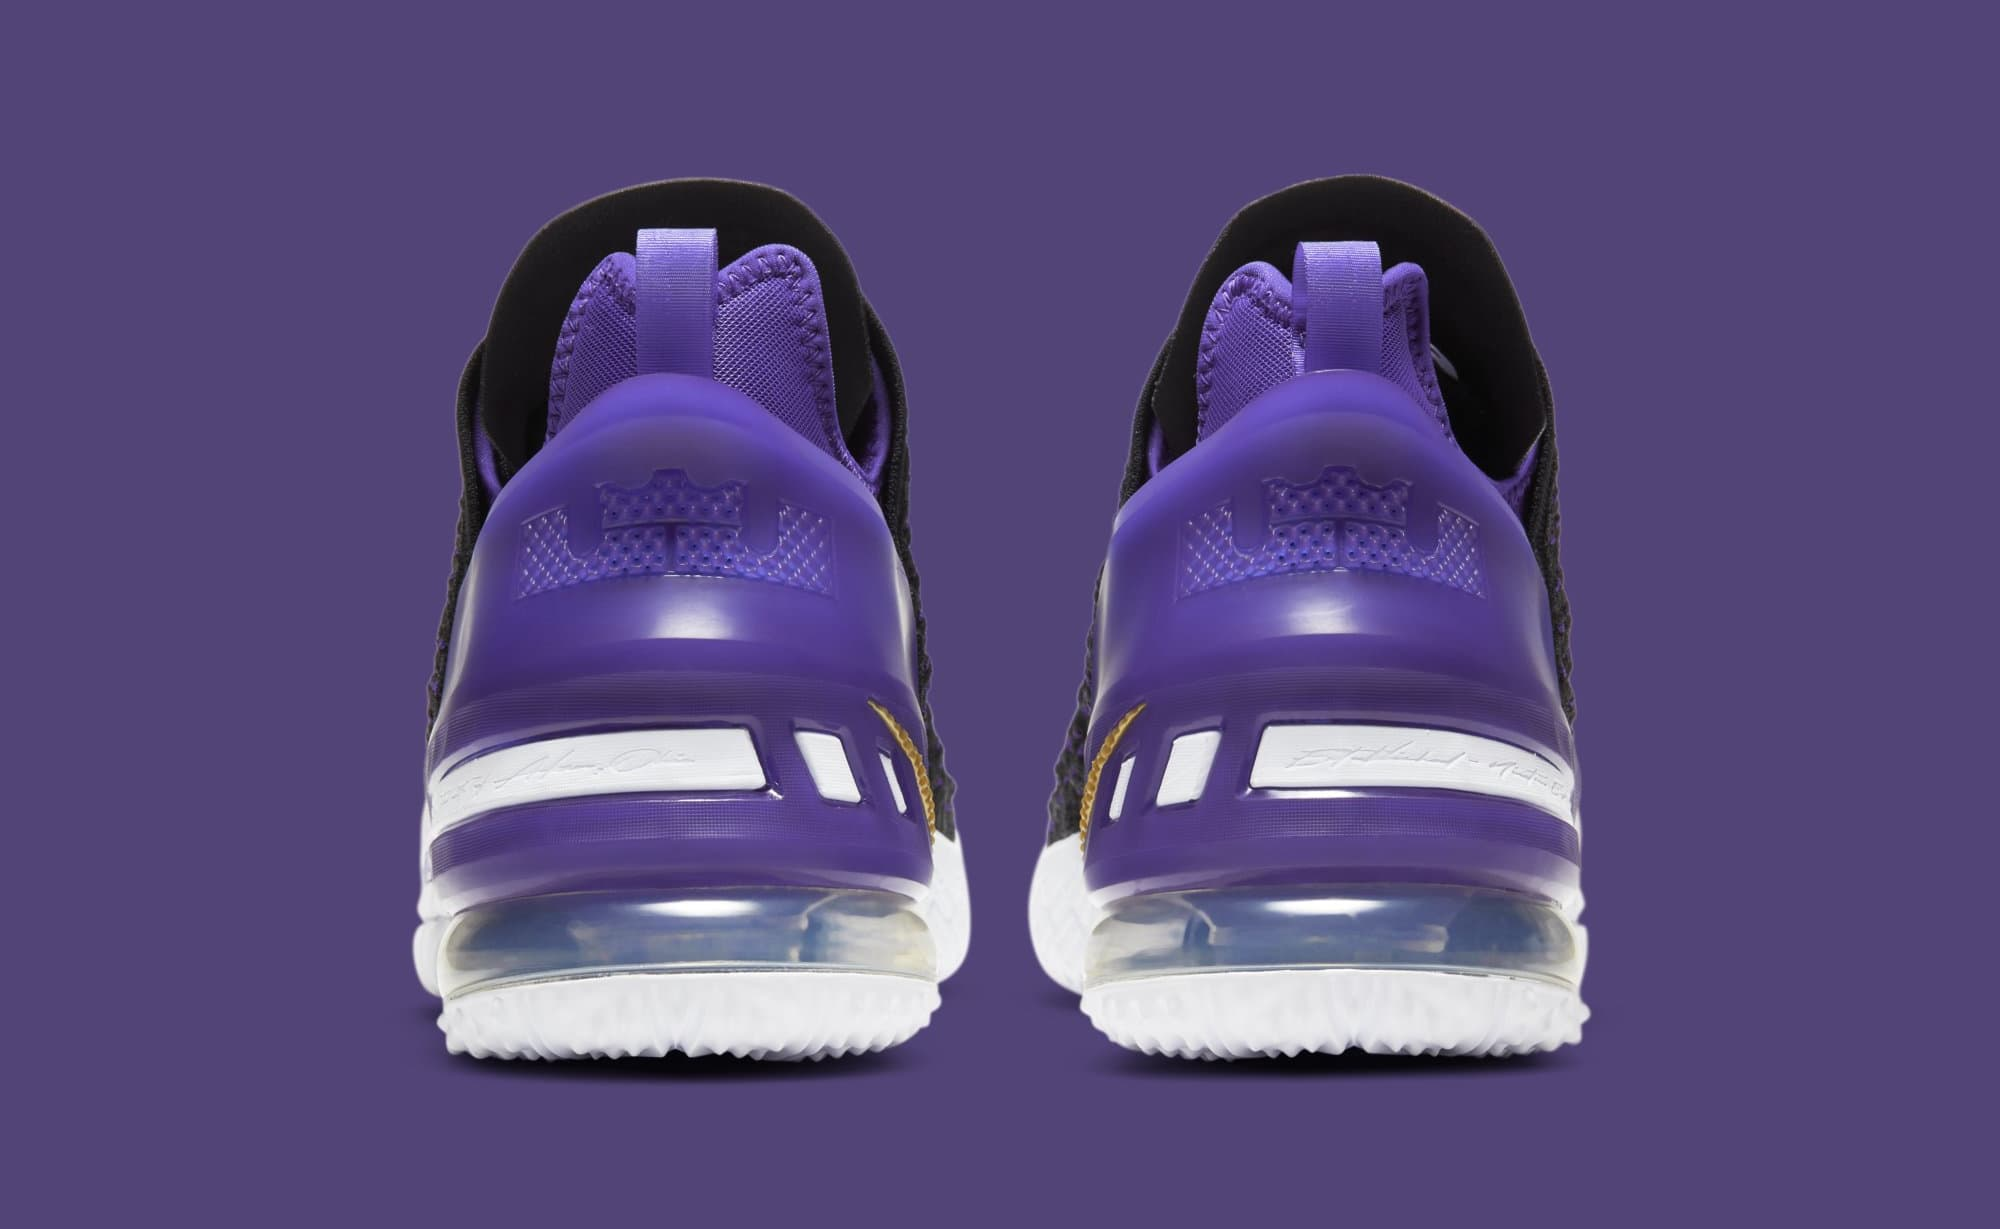 Nike LeBron 18 'Lakers' CQ9283-004 Heel